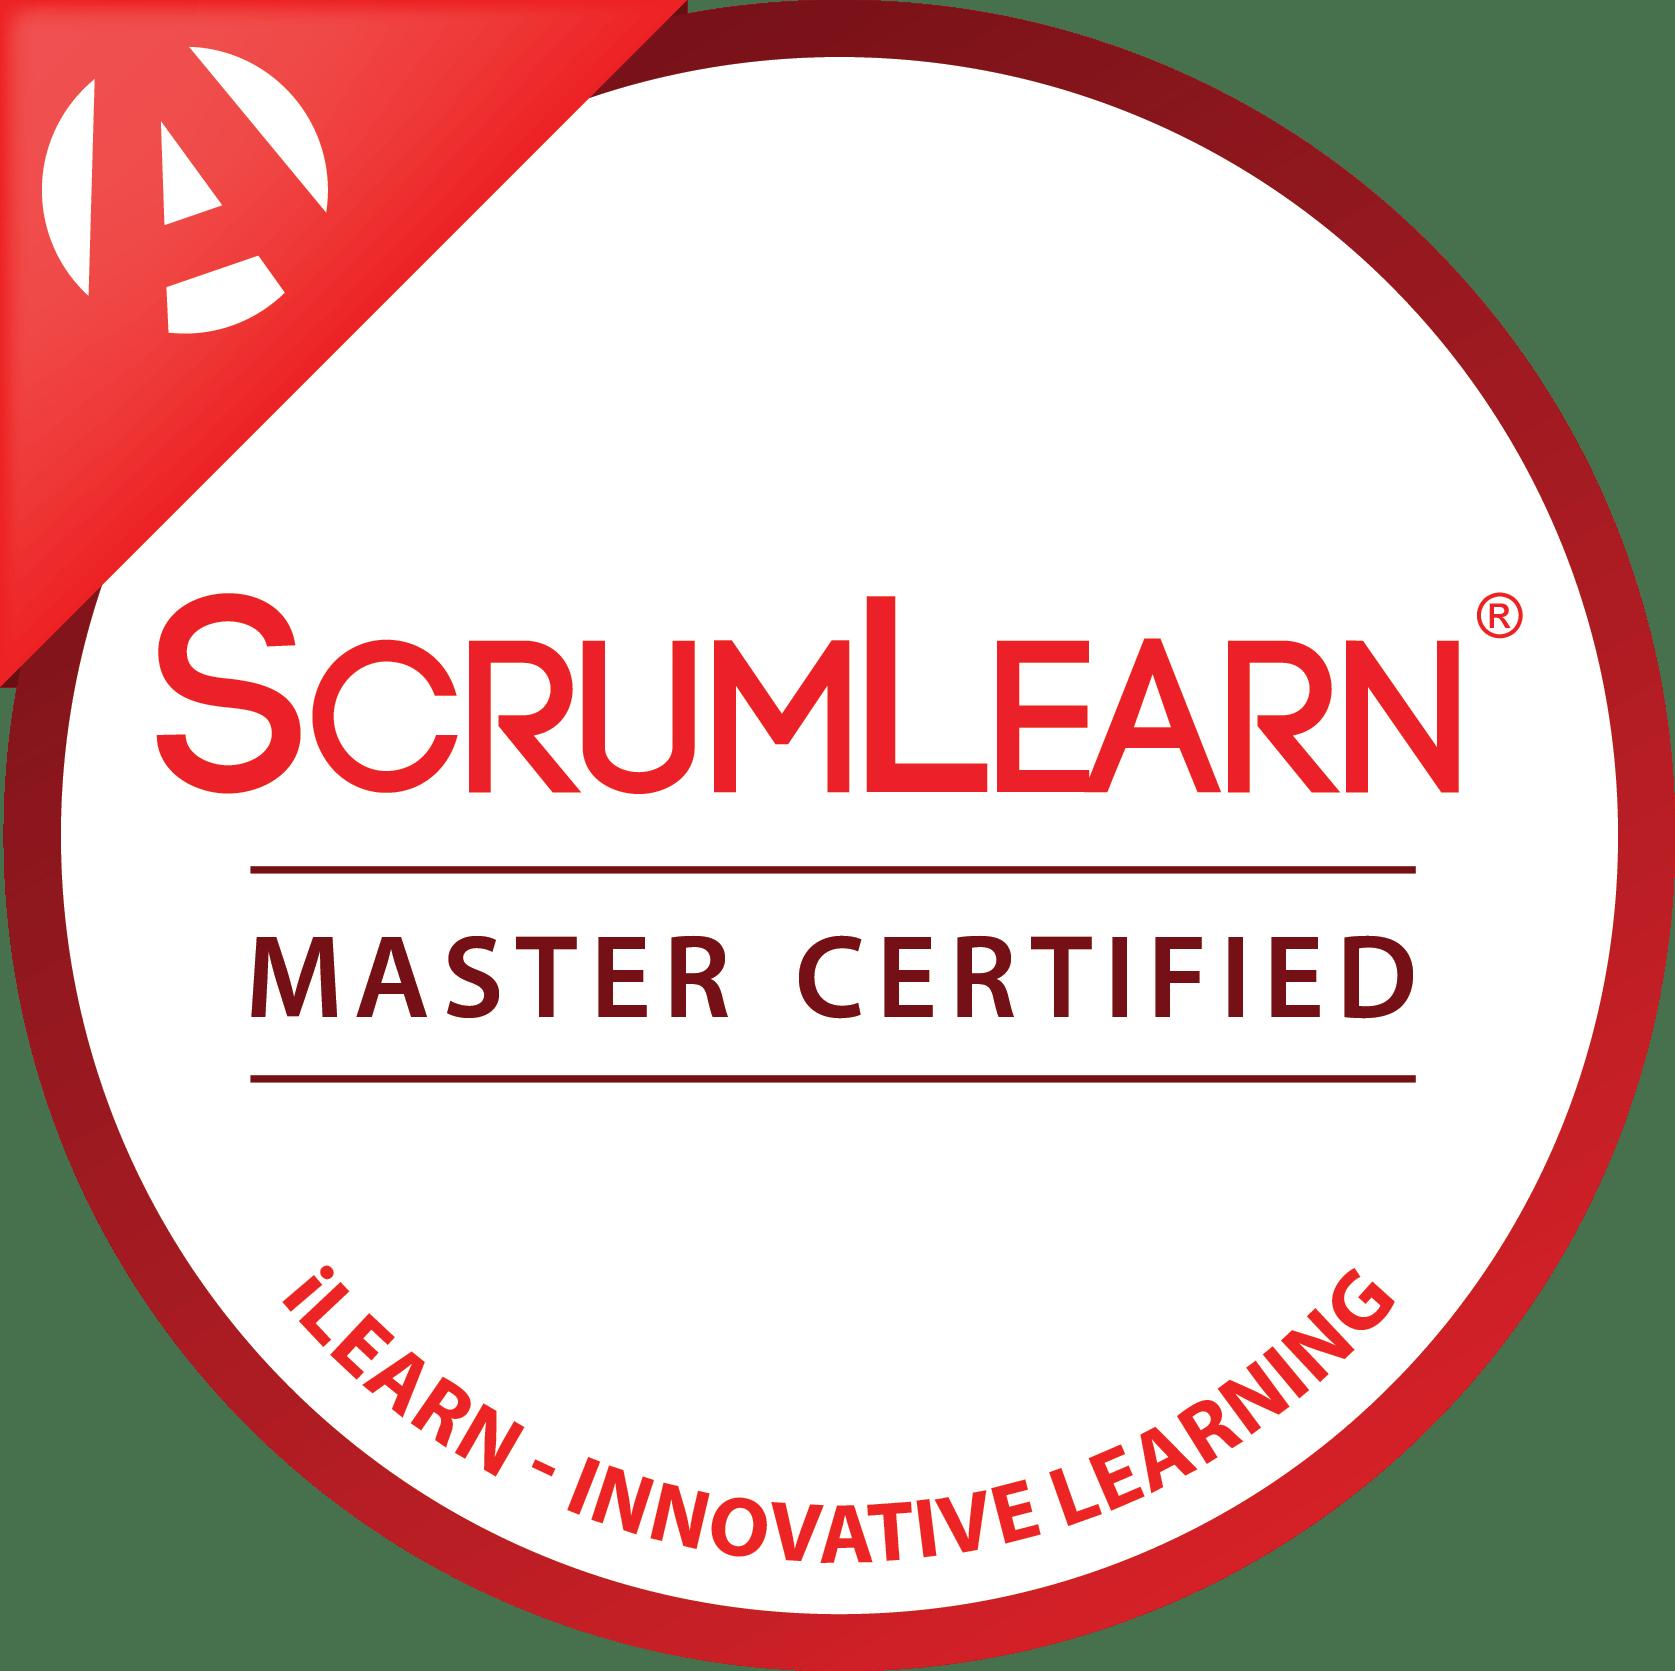 ScrumLearn Scrum Master Certified Digital Badge